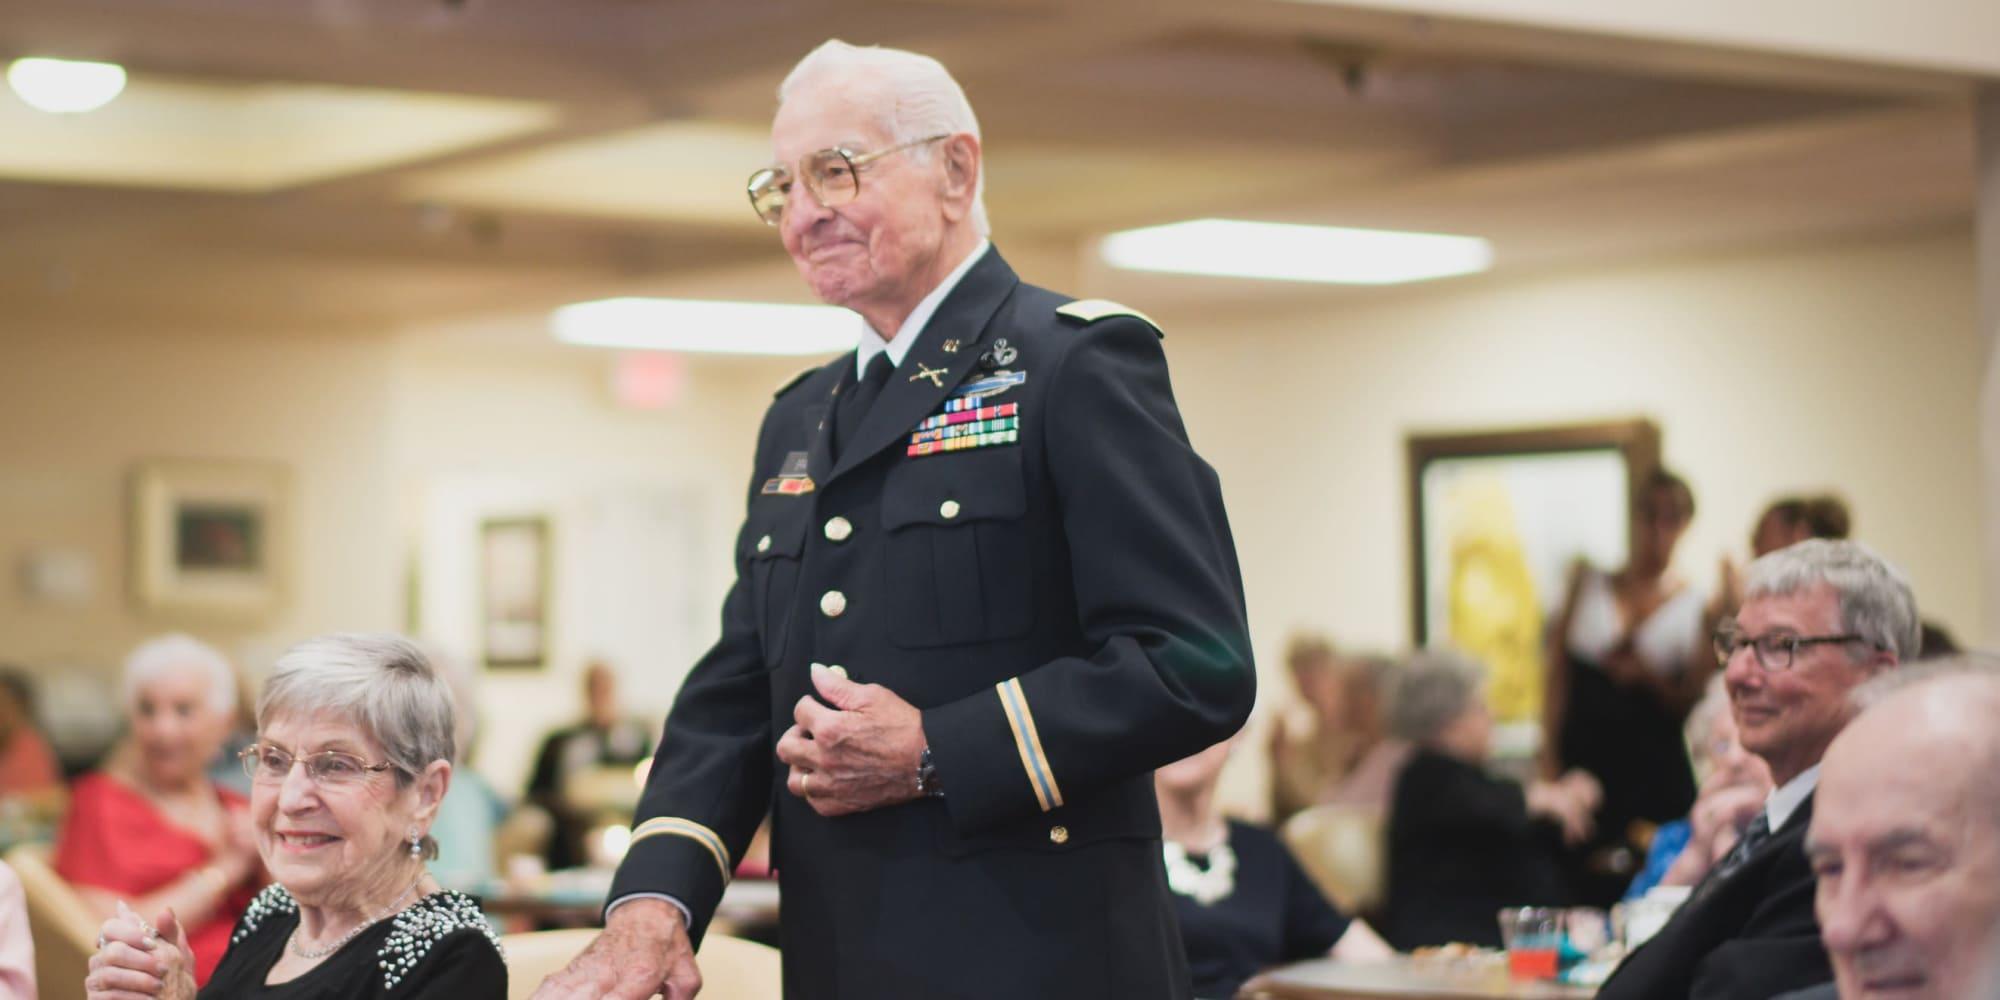 A veteran being recognized at Ashwood Meadows Gracious Retirement Living in Johns Creek, Georgia